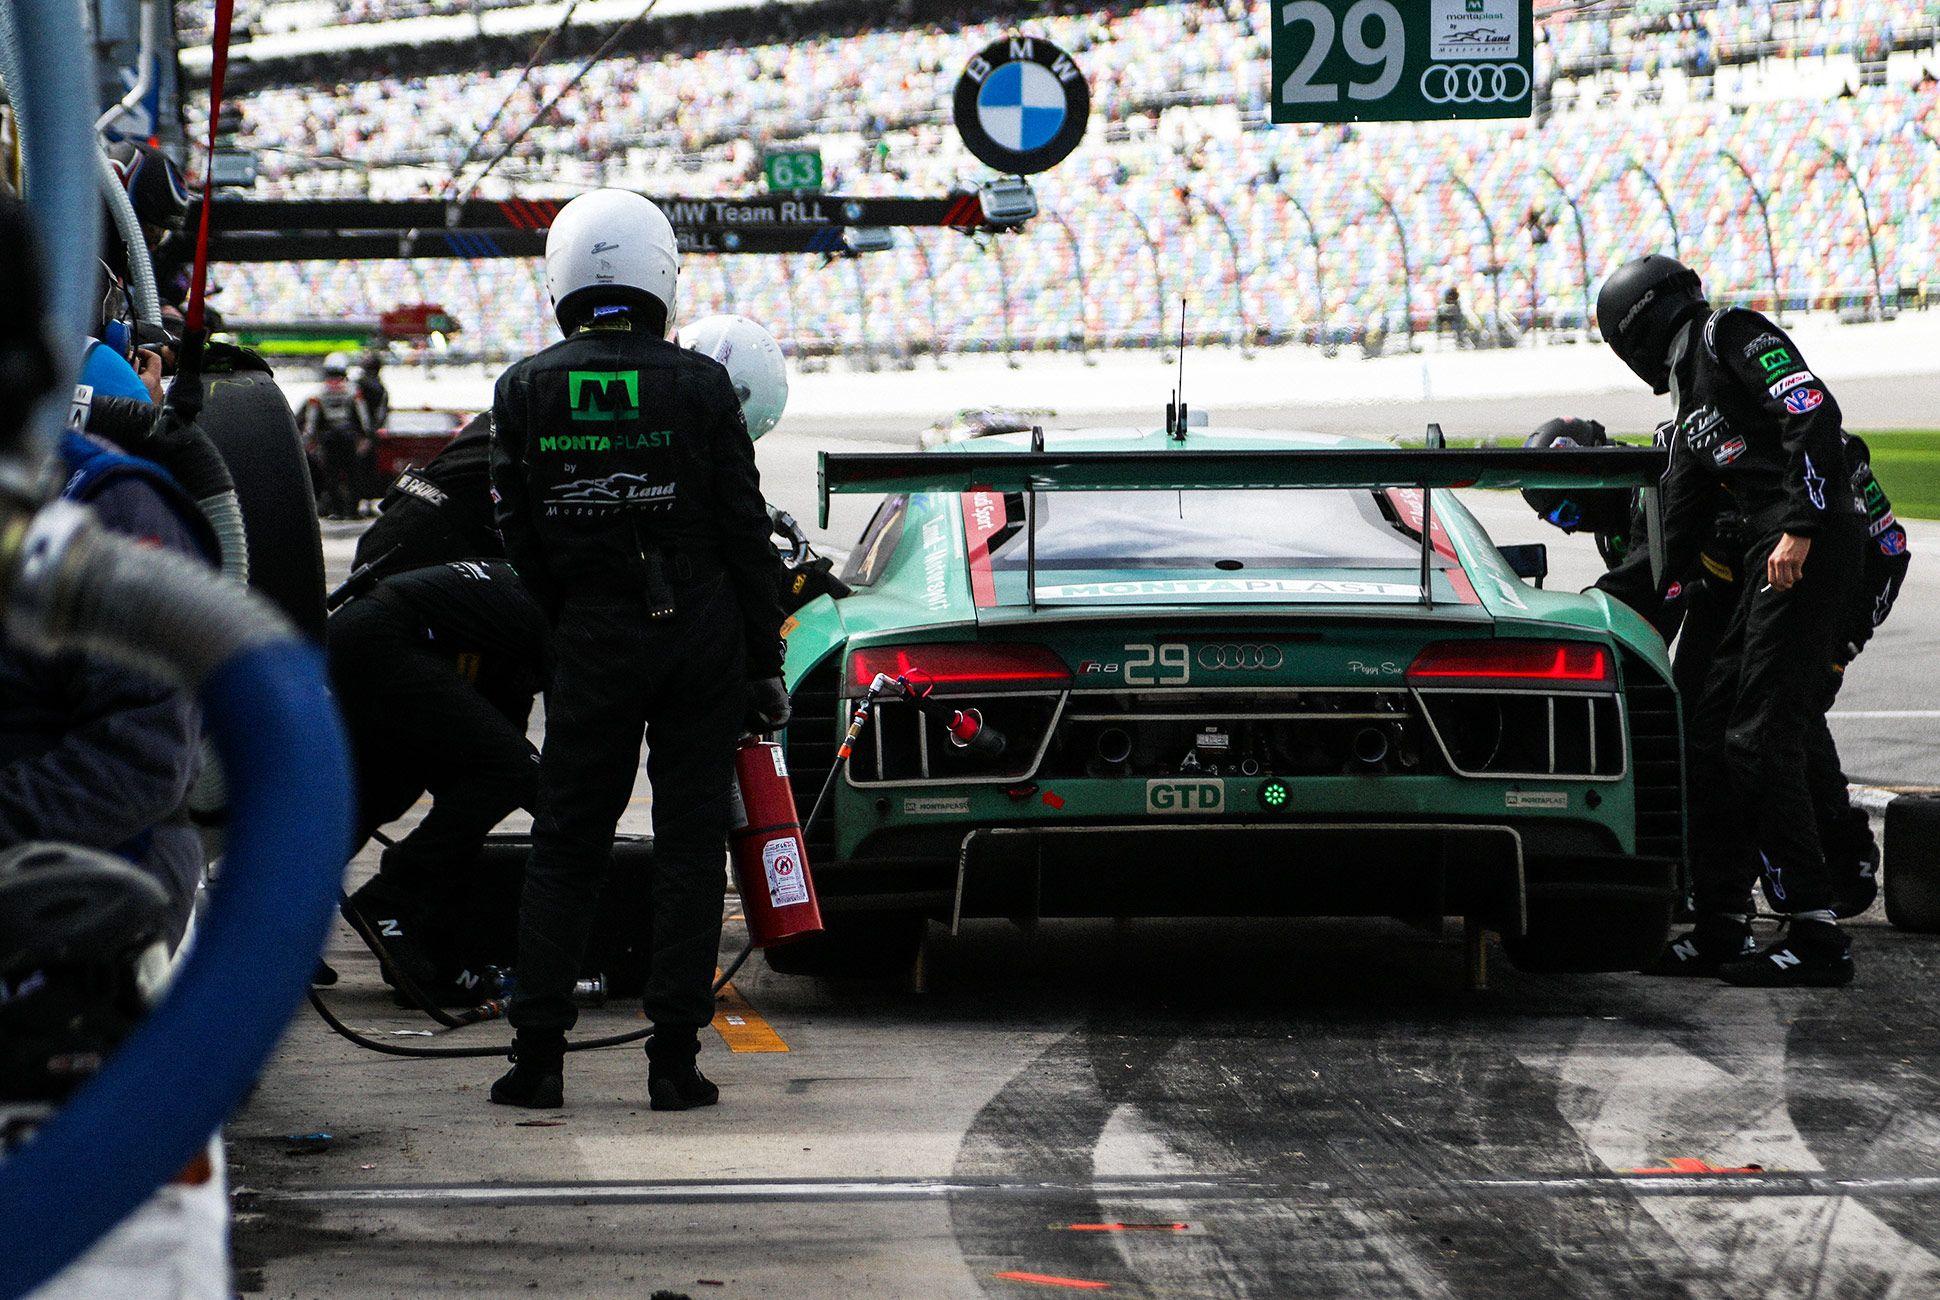 Best-Sports-Cars-of-2018-Daytona-24-Hours-gear-patrol-Audi-R8-LMS-3